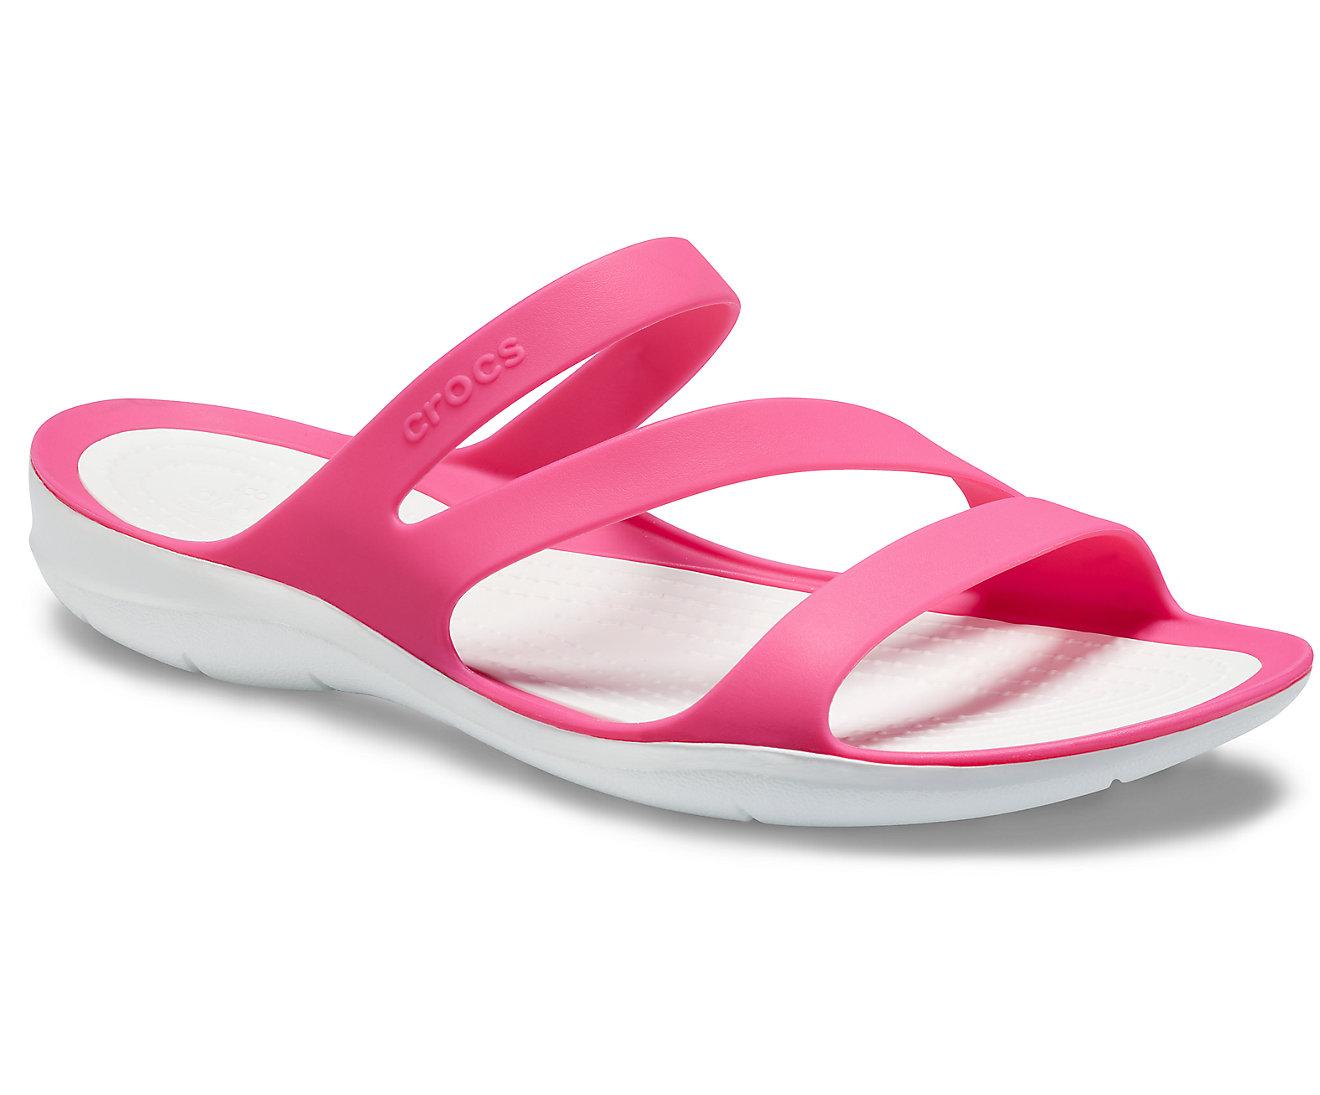 Crocs™ SWIFTWATER SANDAL 203998 Paradise Pink/White Ροζ